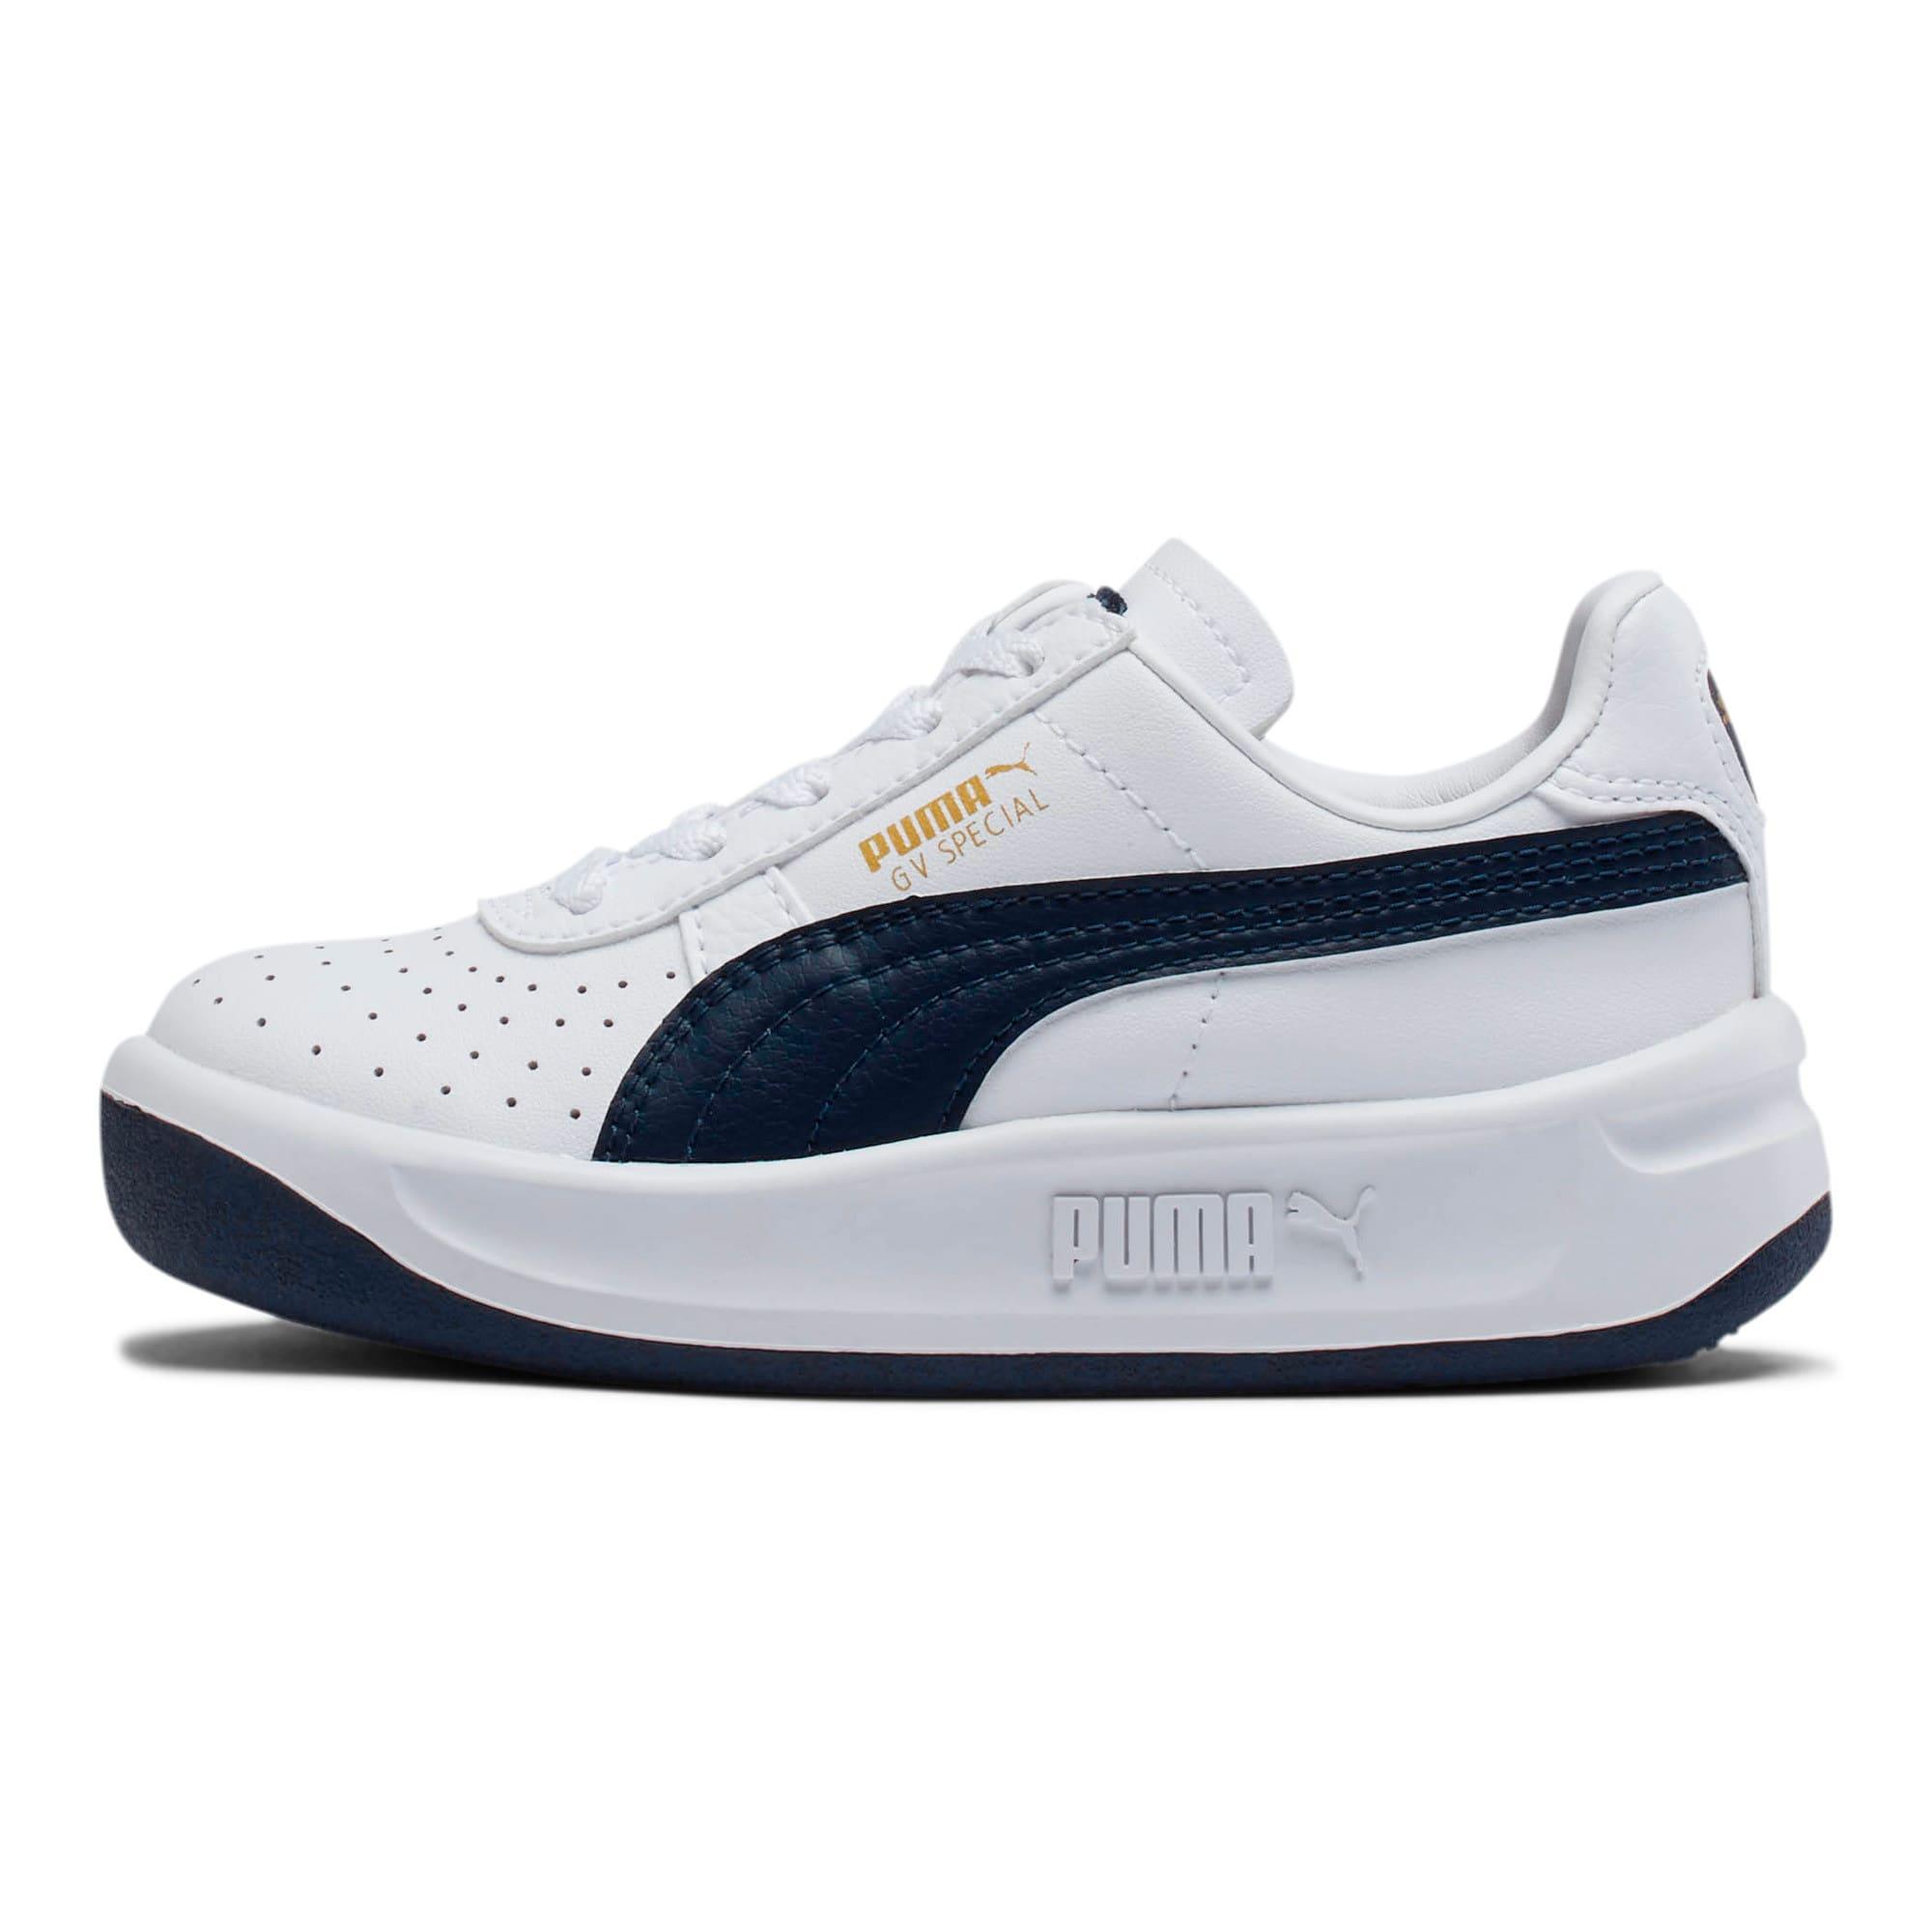 Thumbnail 1 of GV Special Little Kids' Shoes, Puma White-Peacoat, medium